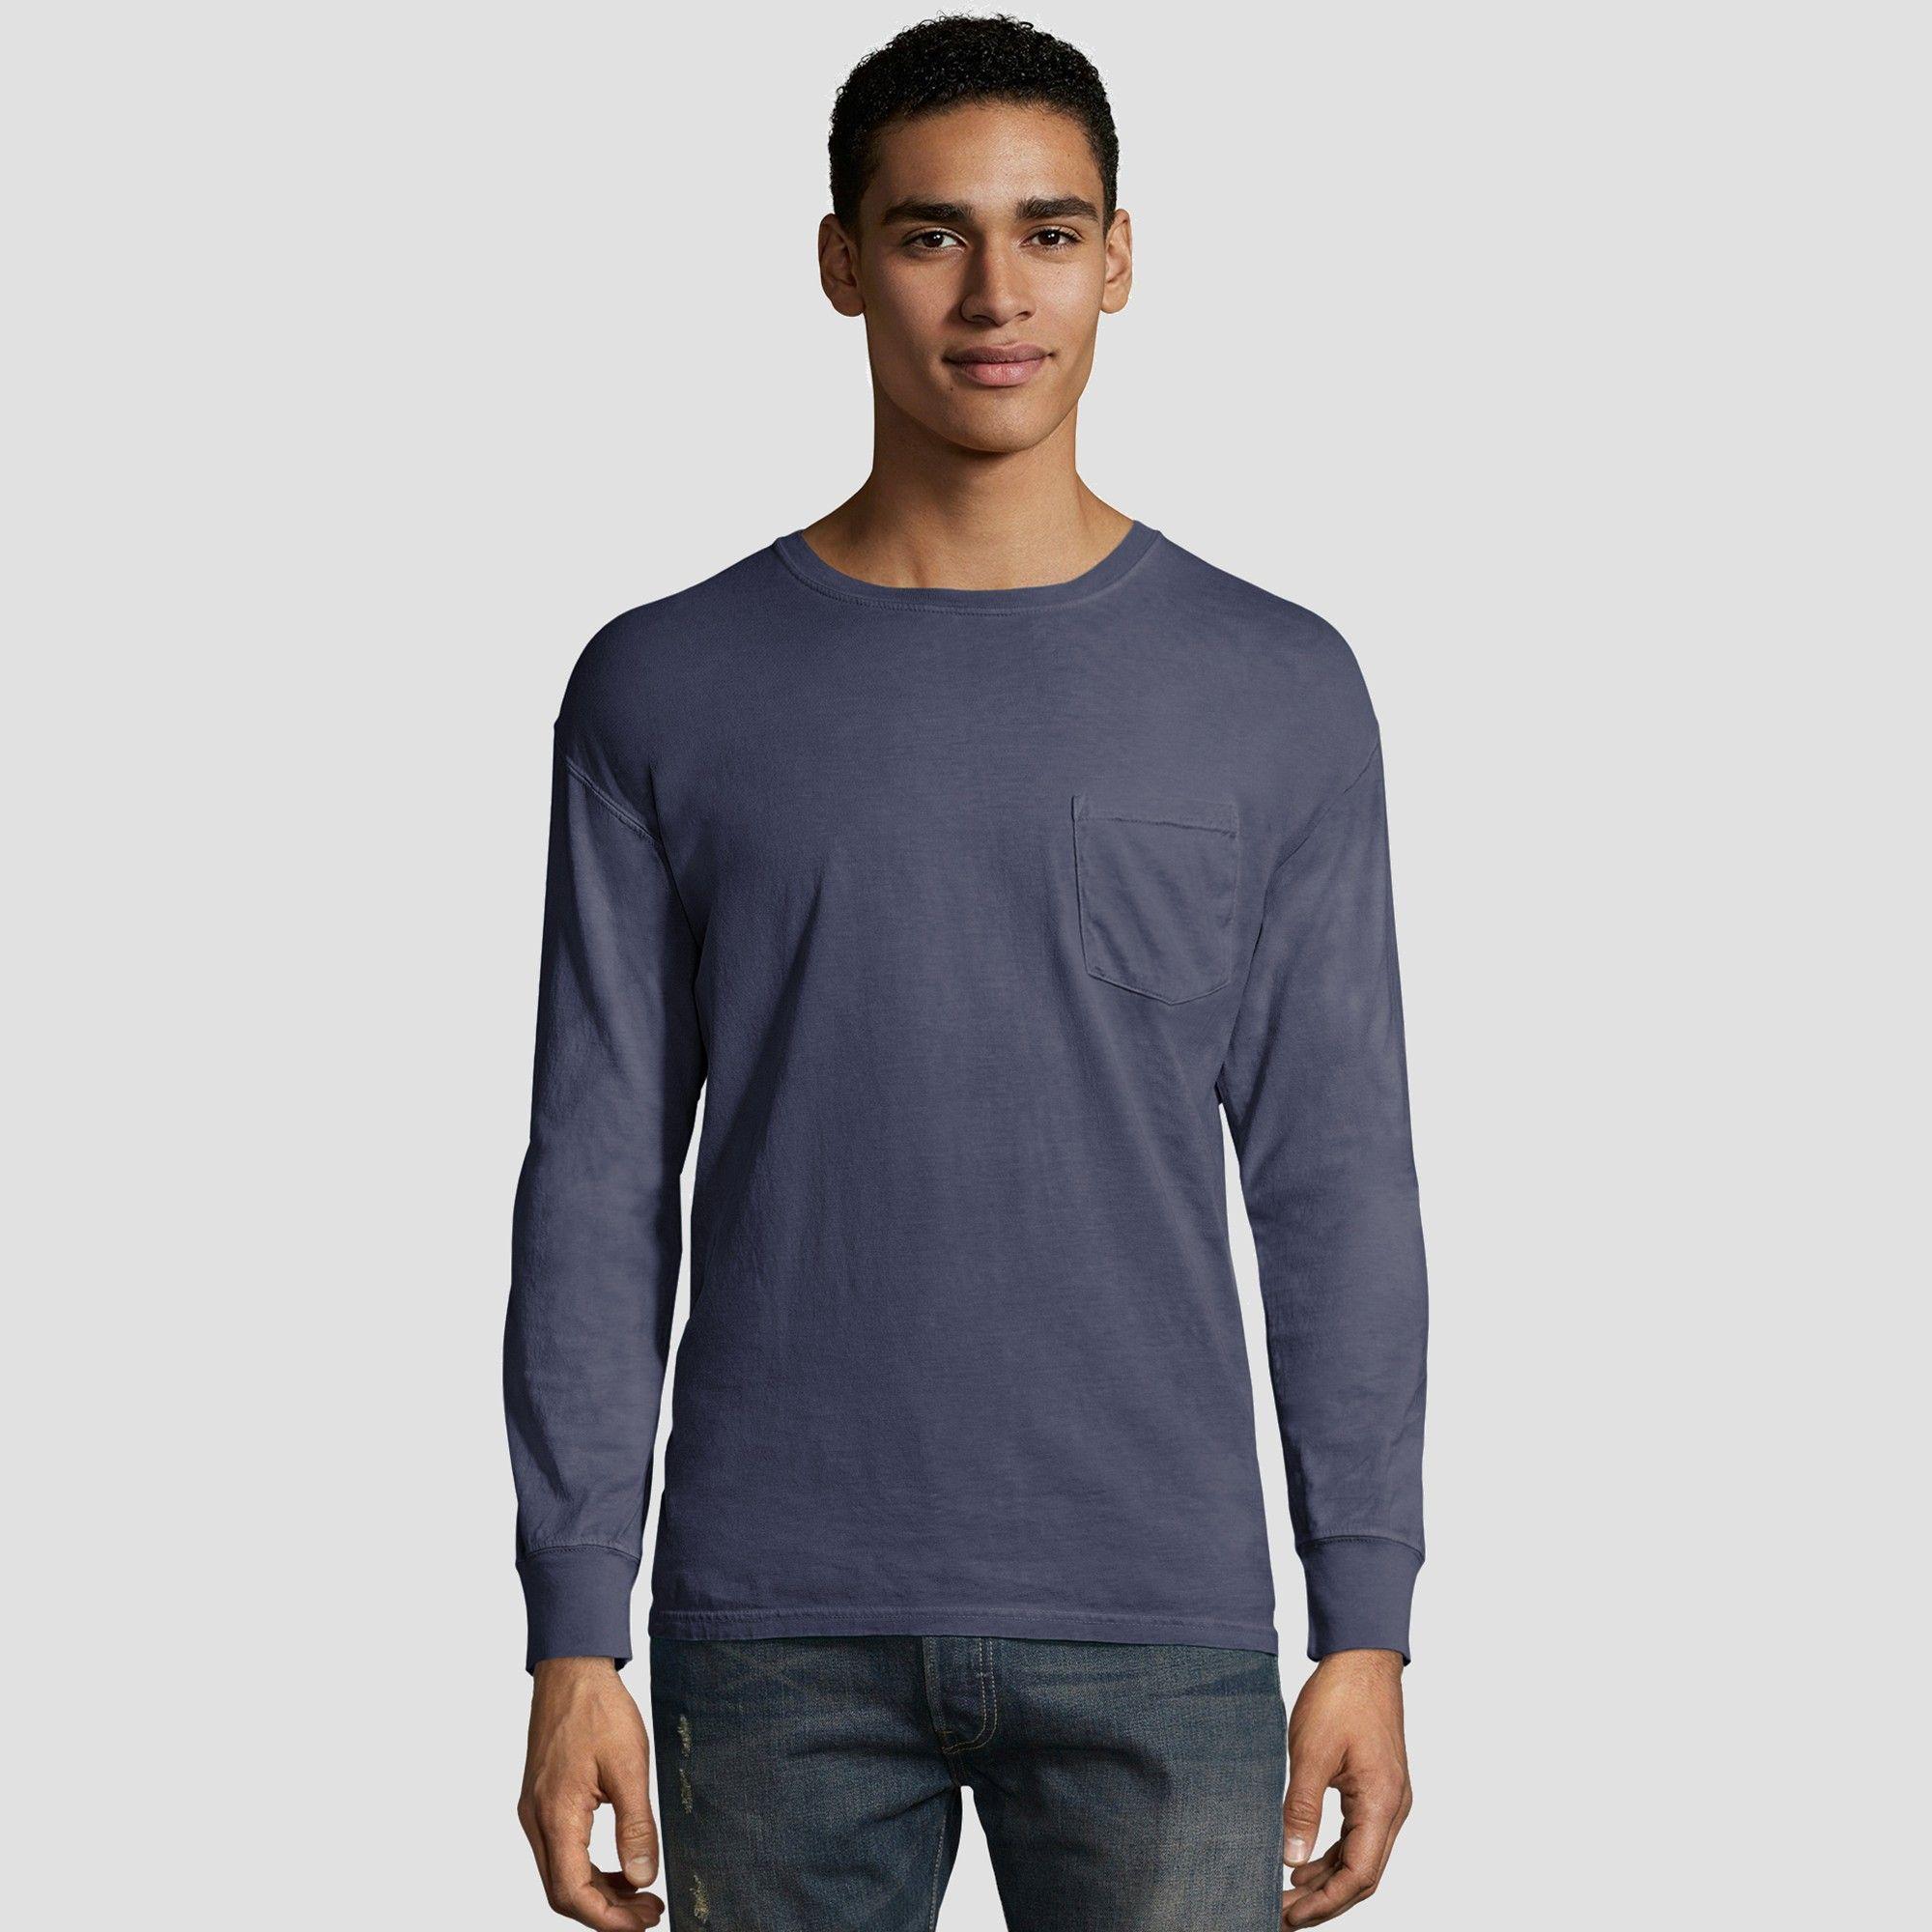 4e37a762f7fc Hanes Men's Long Sleeve 1901 Garment Dyed Pocket T-Shirt - Slate (Grey) 2XL